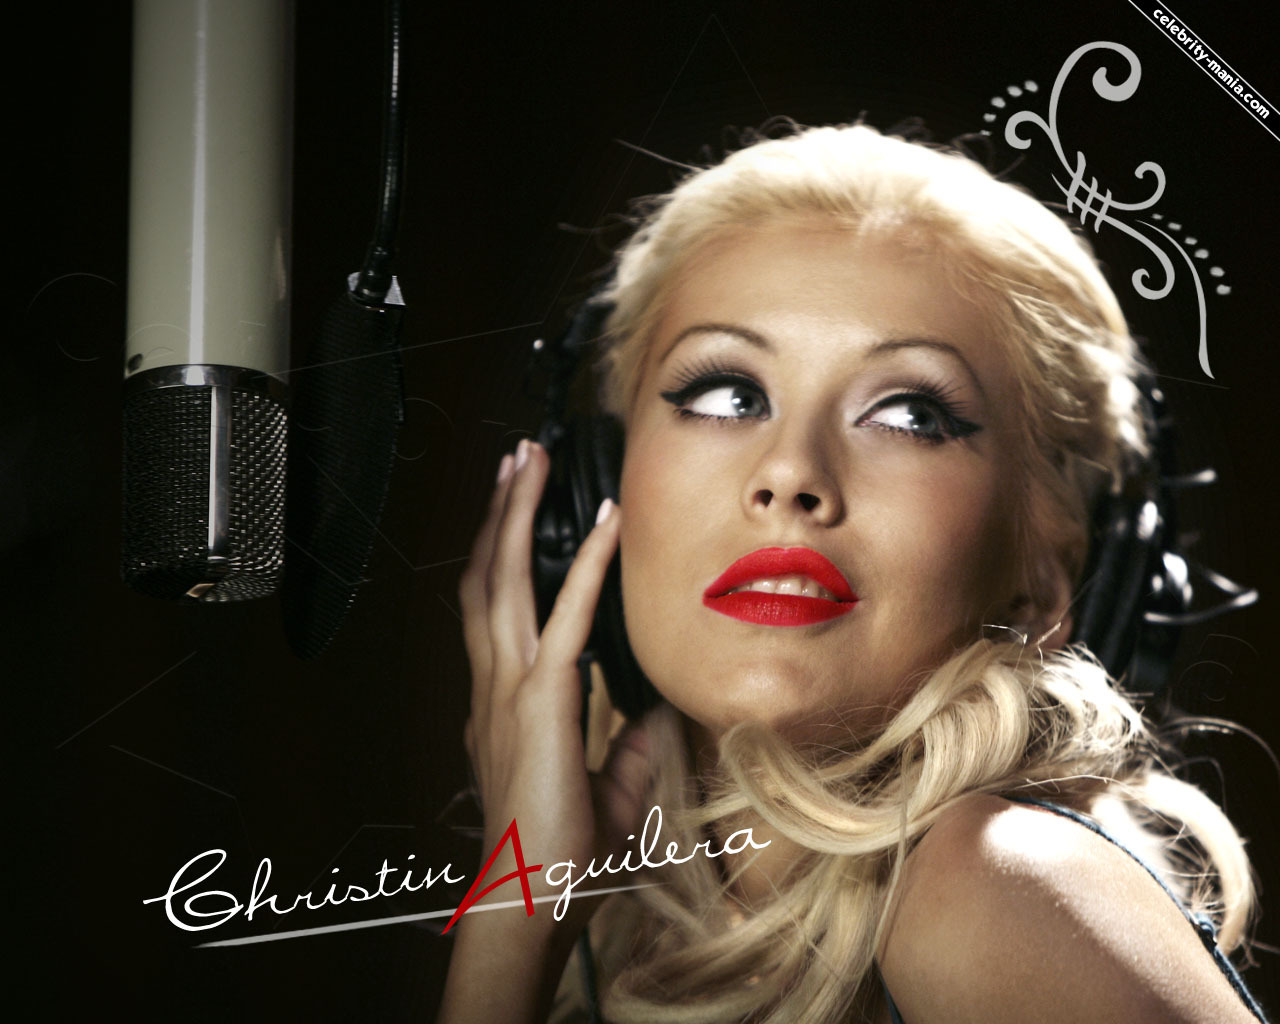 http://2.bp.blogspot.com/_dFV62vTXpCg/TB_7M9W9c8I/AAAAAAAAABI/FOW2koRm8ZY/S1600-R/Christina-christina-aguilera-982343_1280_1024.jpg